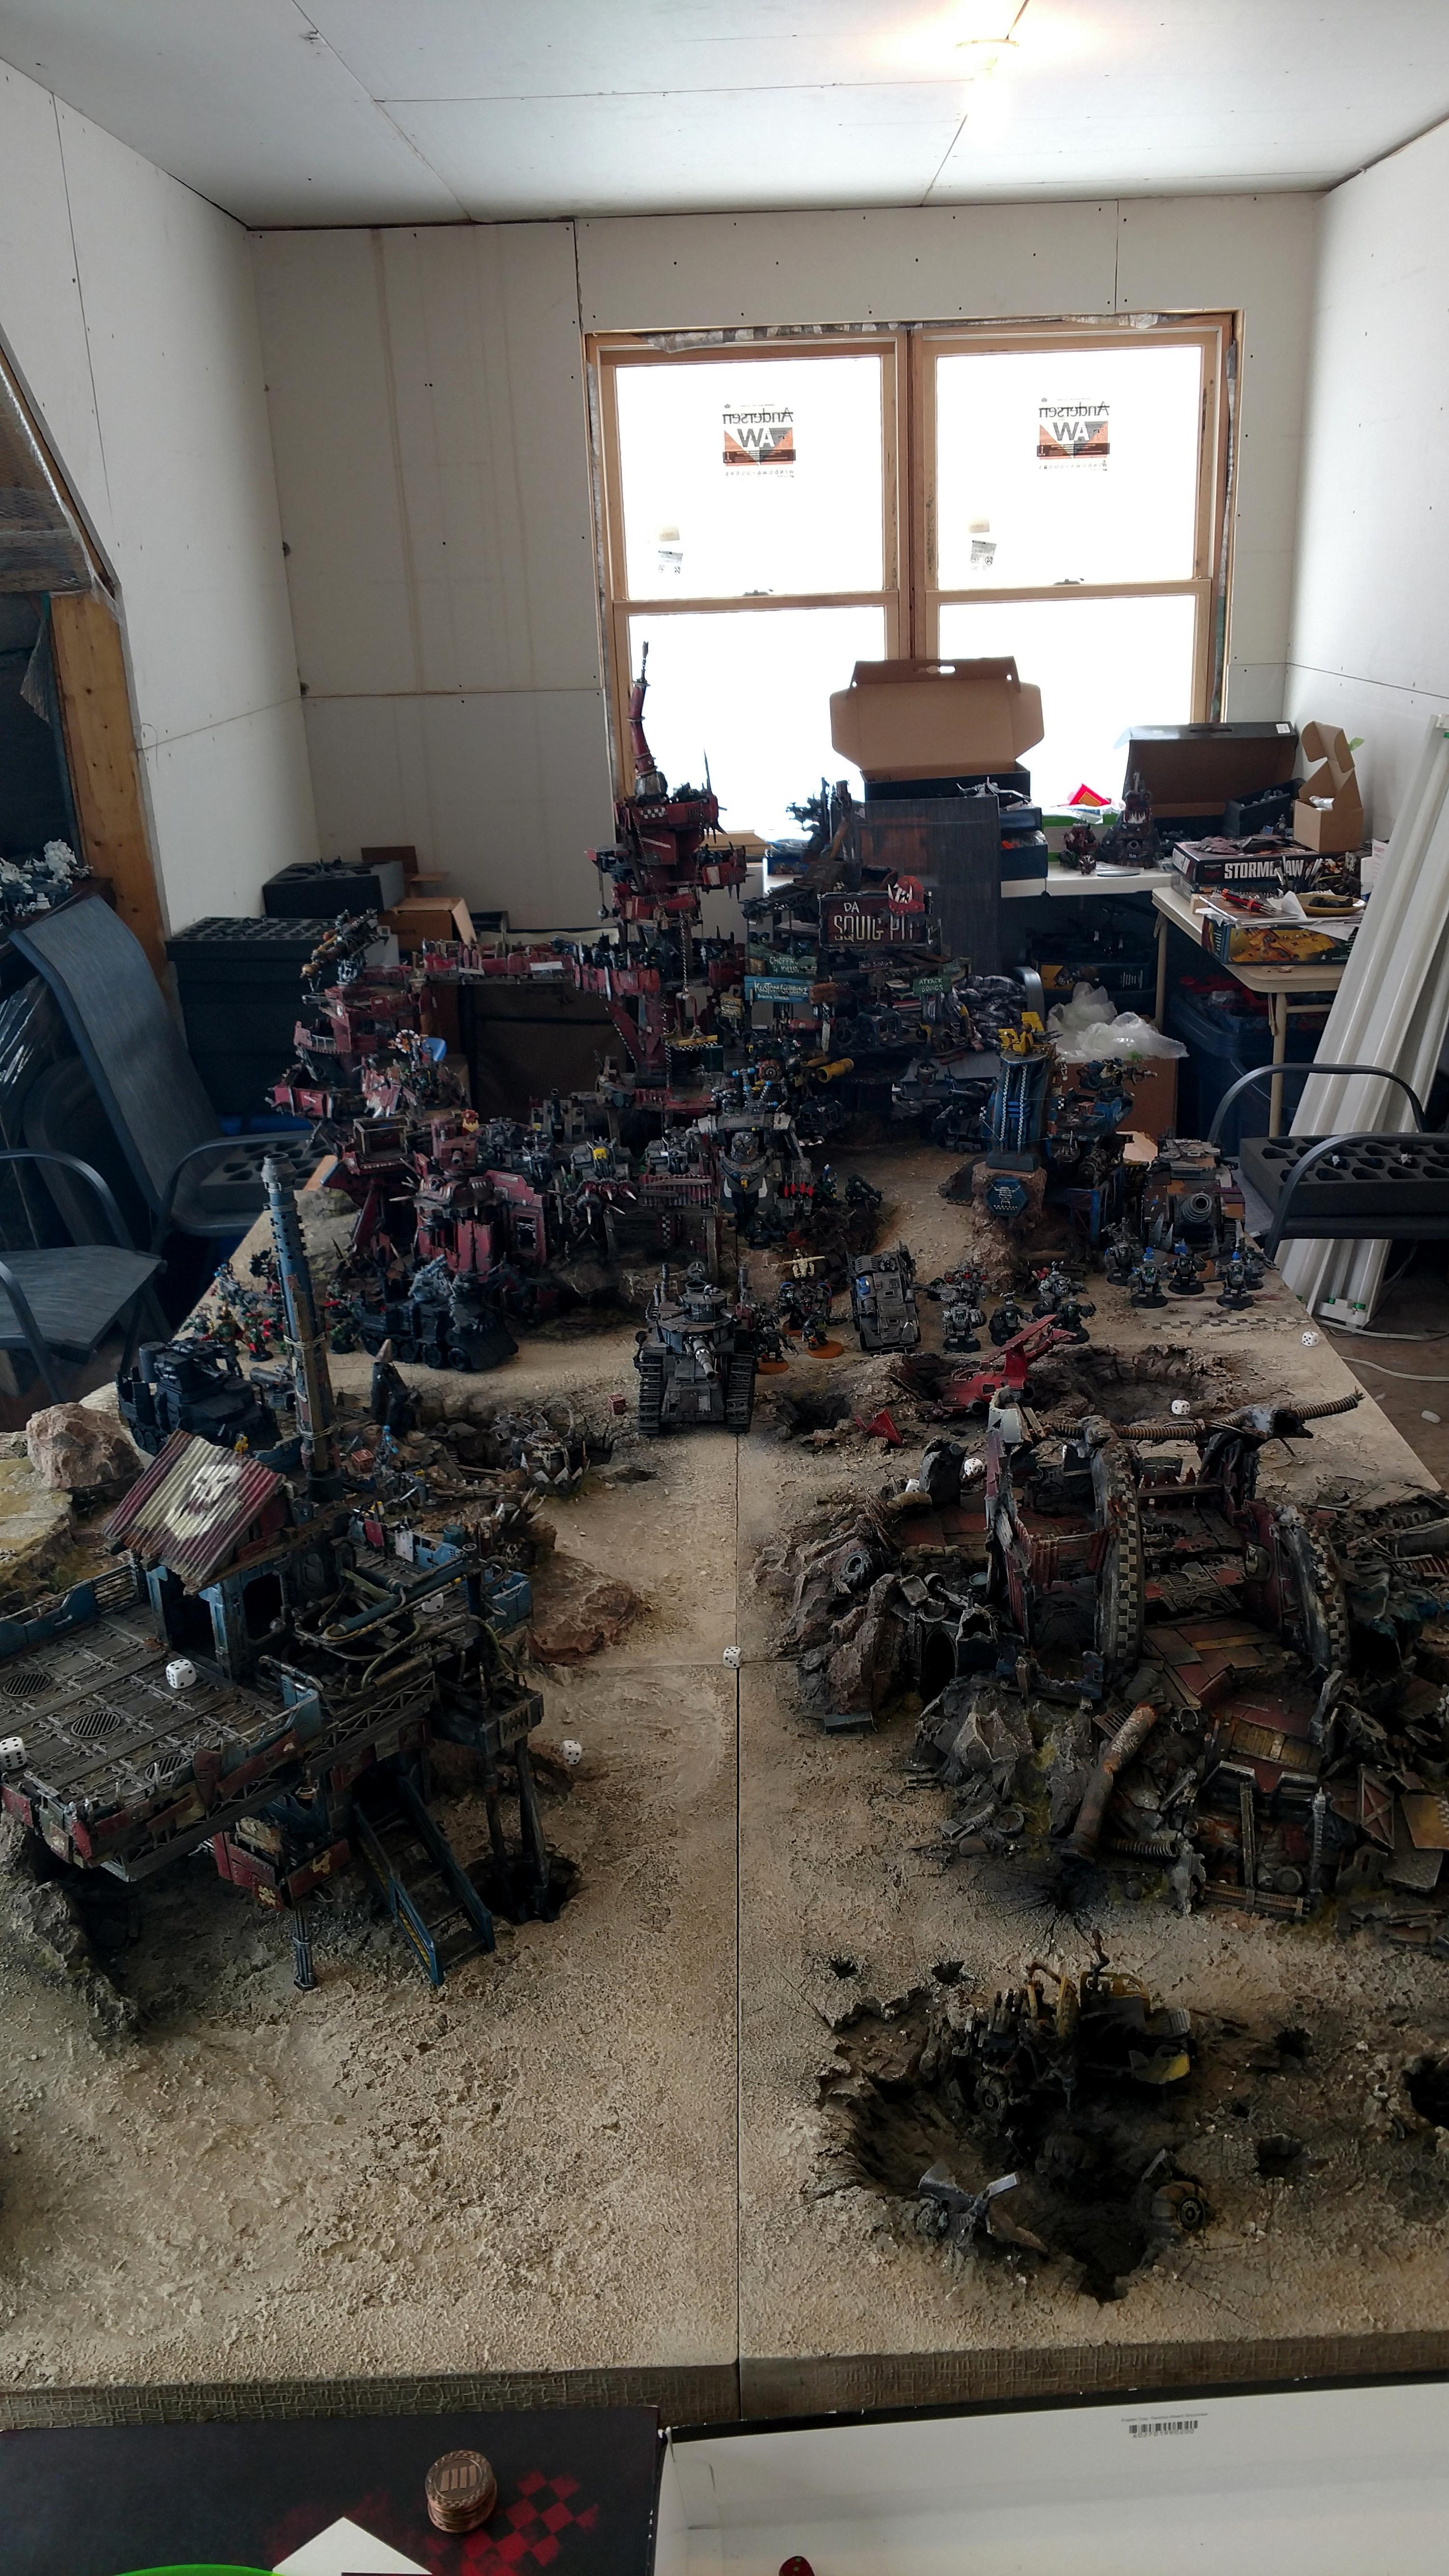 Base, Board, Conversion, Fort, Fortification, Fortress, Game Table, Greenskins, Junk, Junkyard, Orks, Plasticard, Realm Of Battle, Scrap, Scrapyard, Stronghold, Terrain, Warhammer 40,000